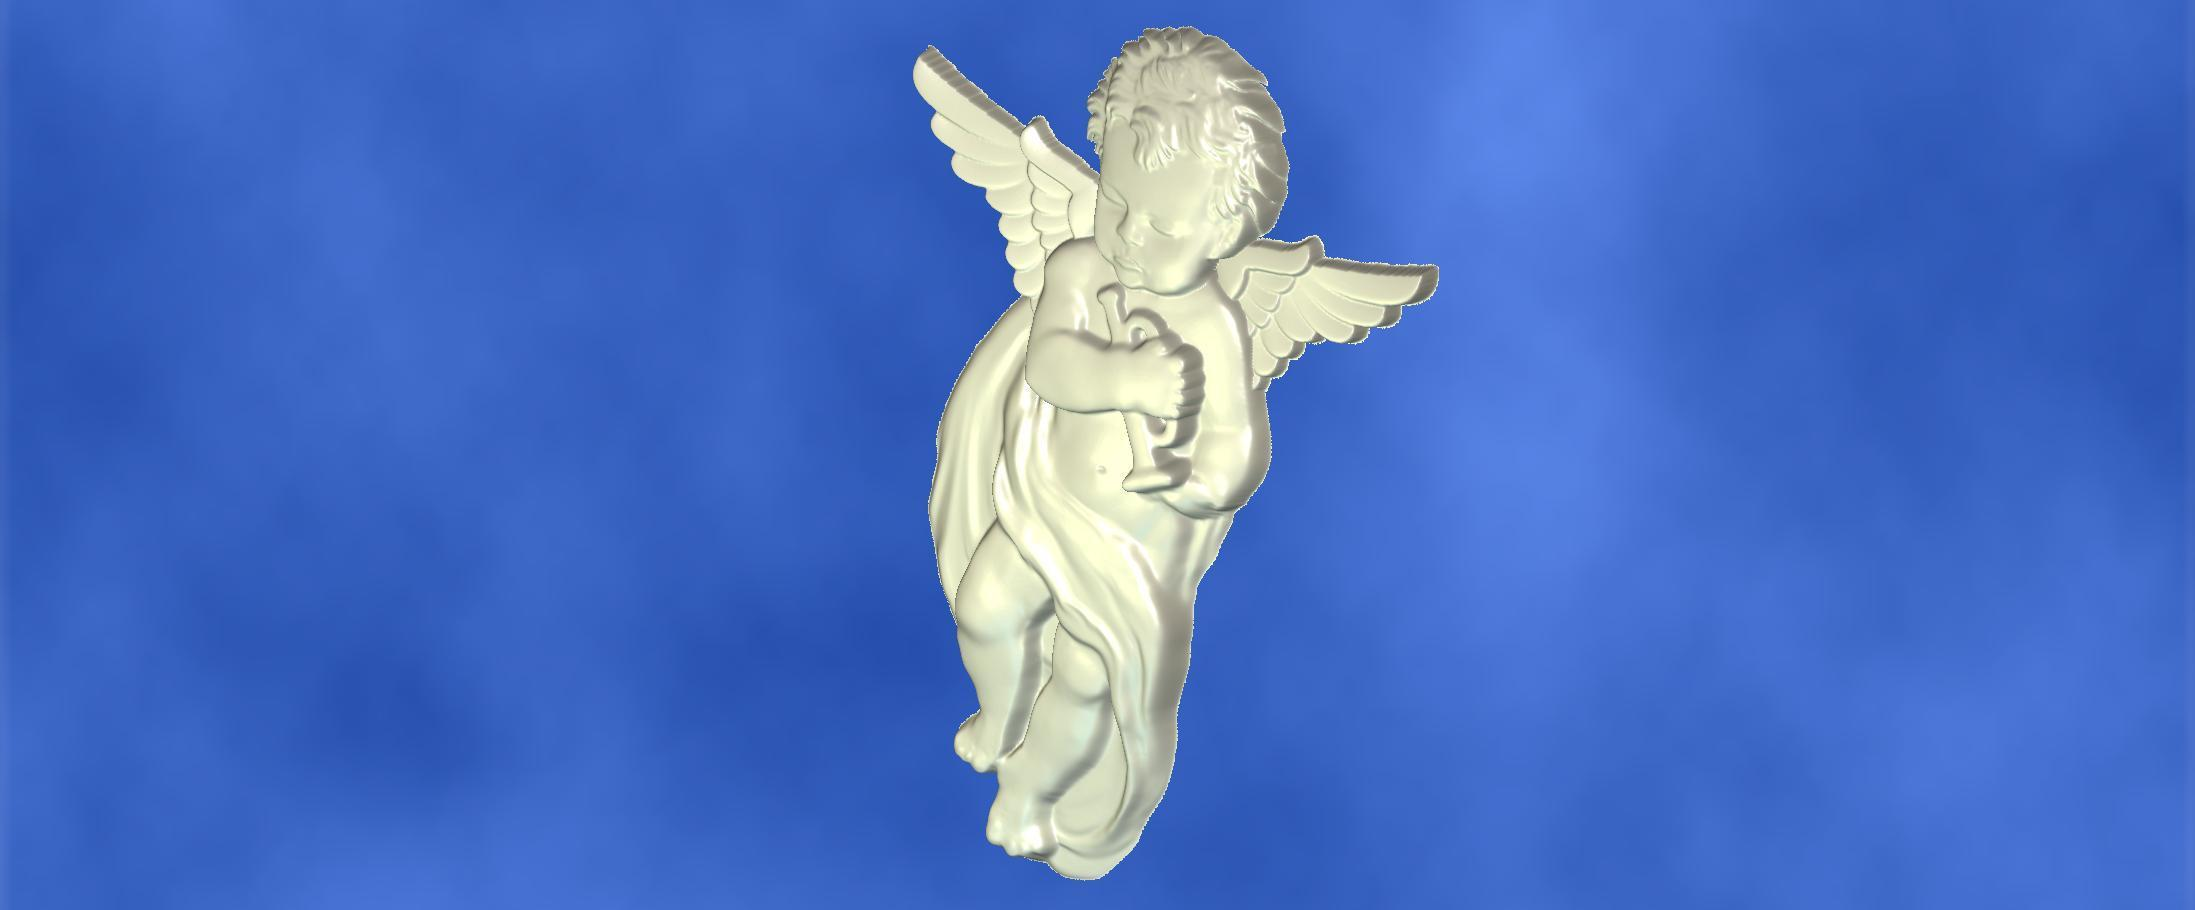 3.jpg Download free STL file 3D STL MODEL CHERUB  • 3D print model, ALPHA_MENA